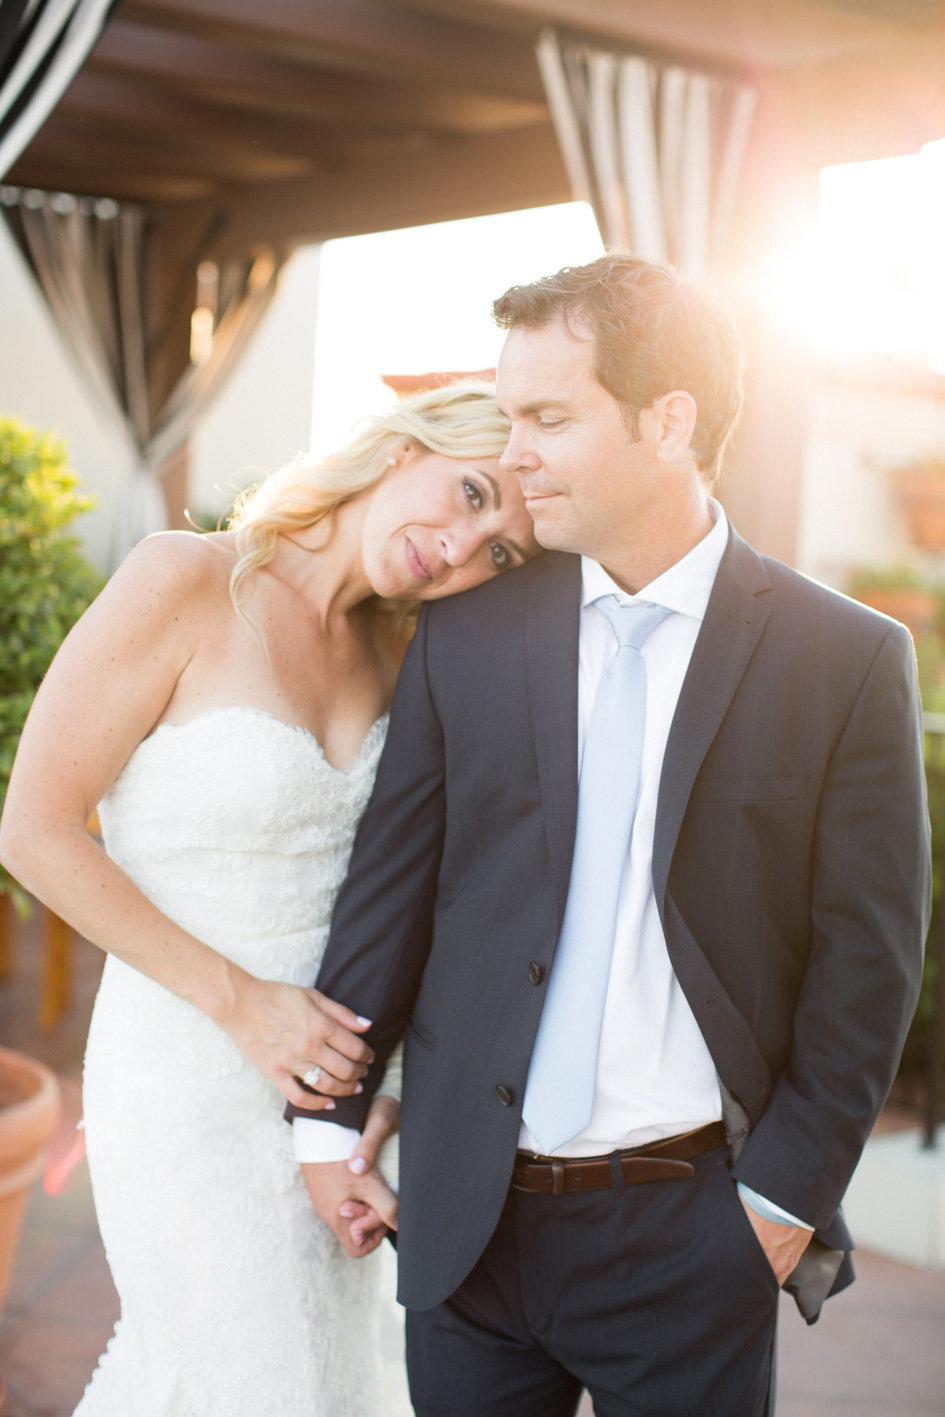 www.santabarbarawedding.com | Anna J Photography | Canary Hotel | Bride and Groom